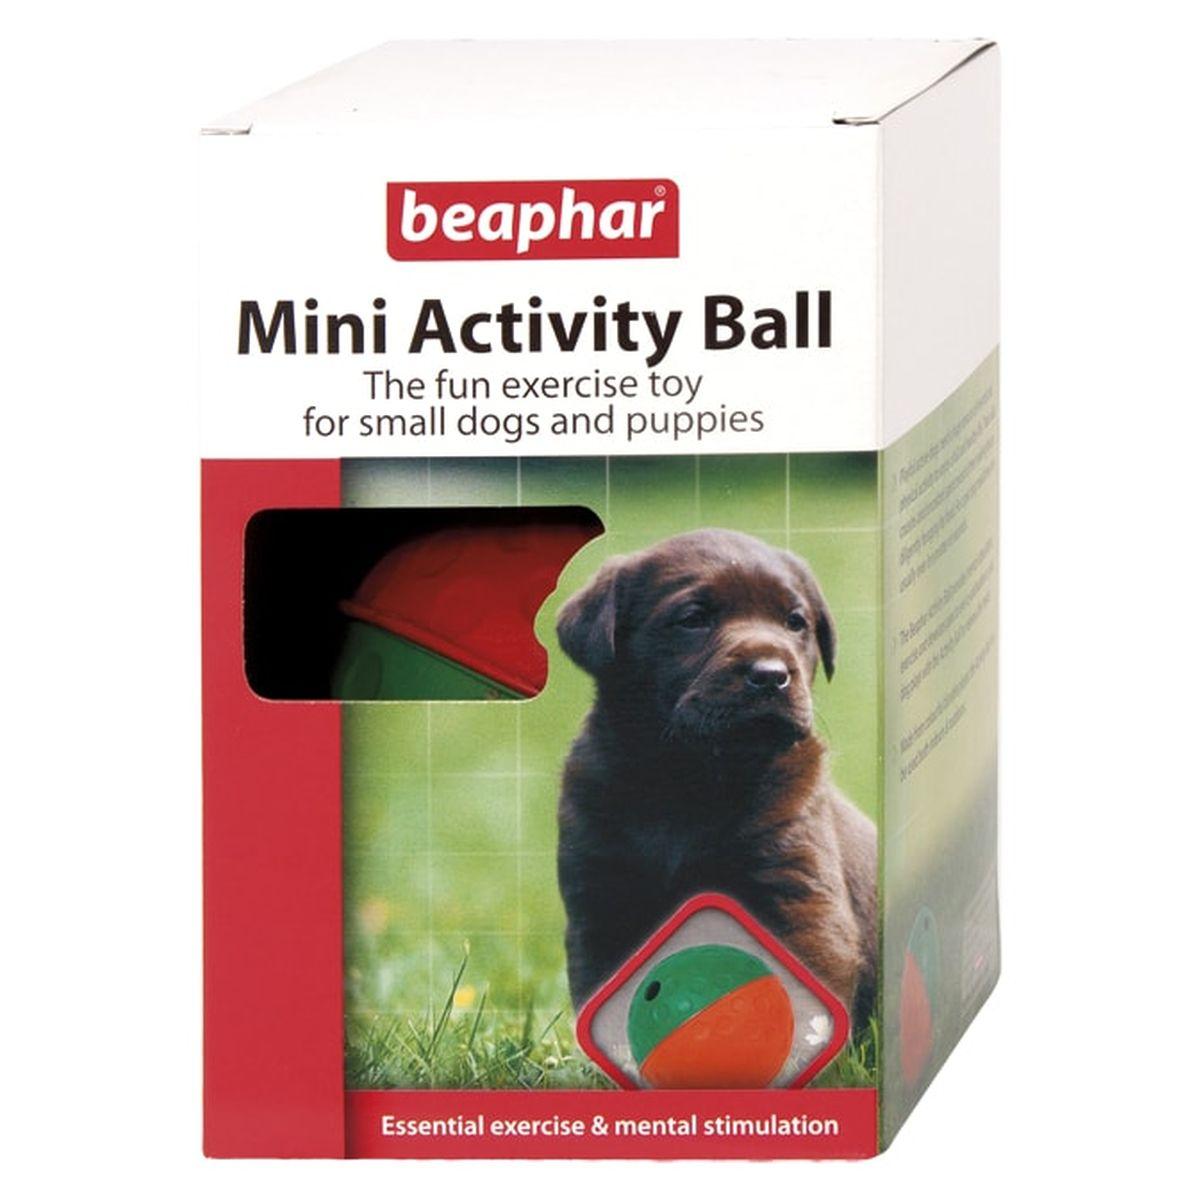 BEA MINI ACTIVITY BALL 00001